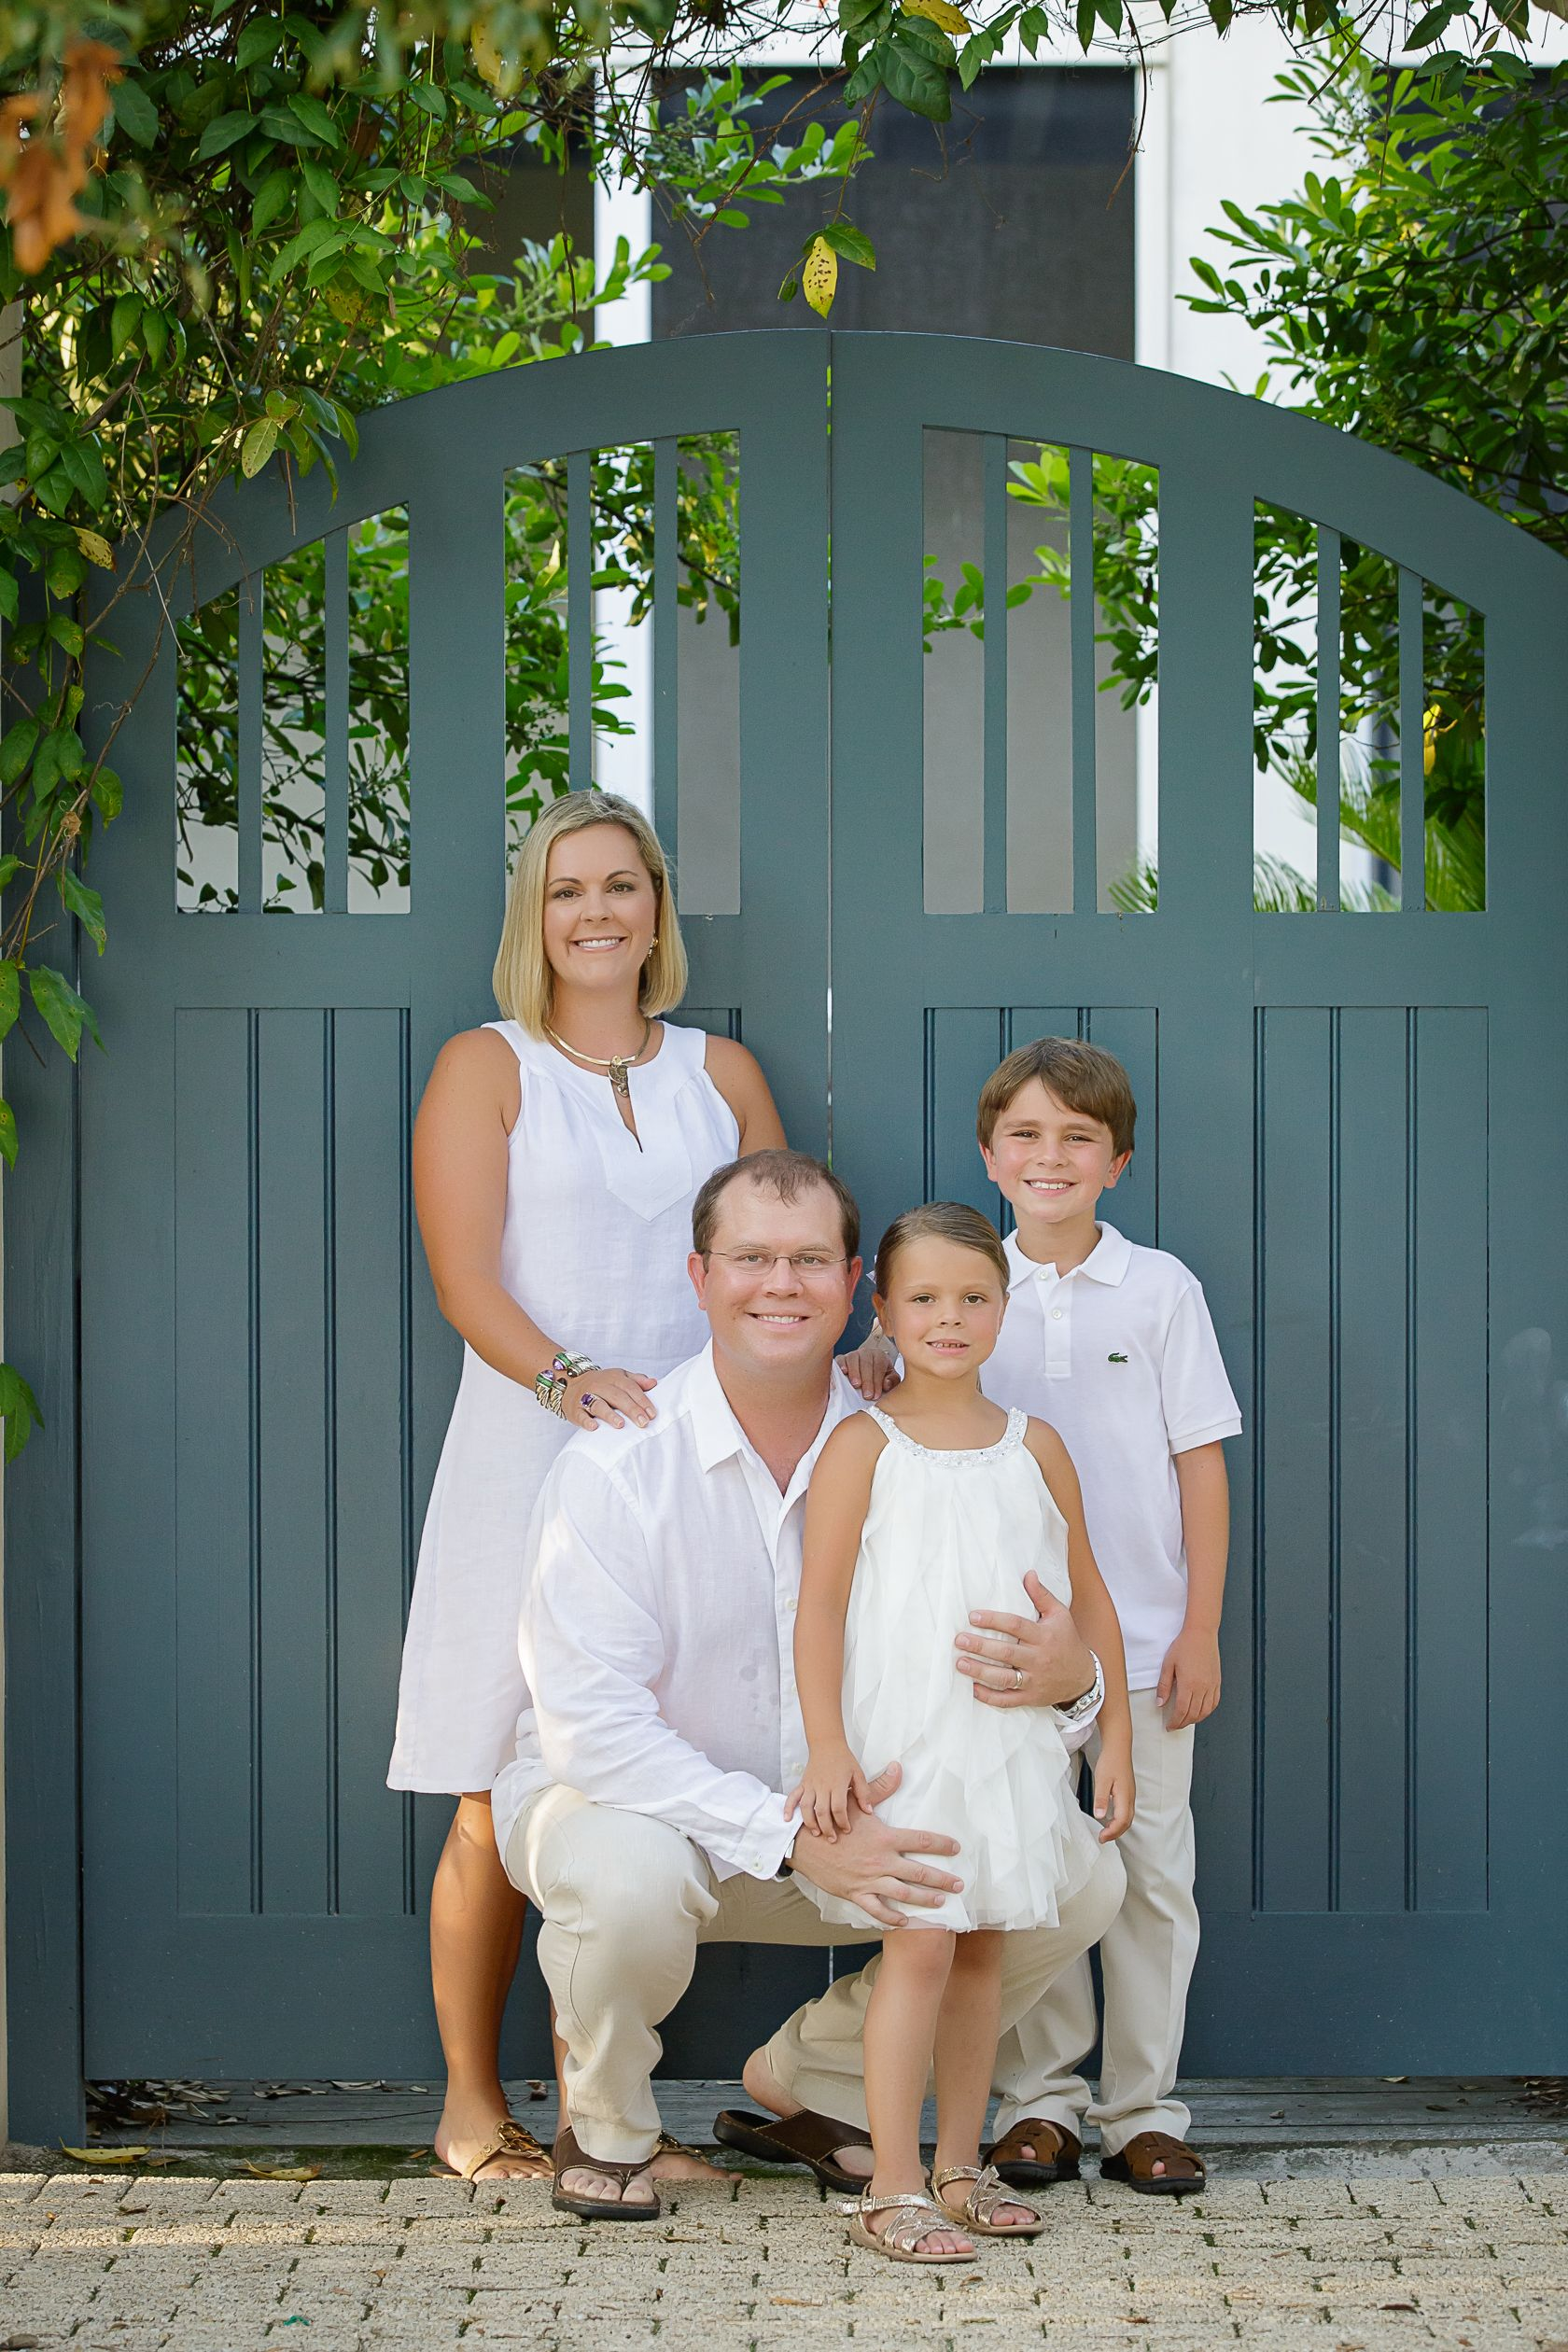 Klein Family vacation to Rosemary Beach, FL.